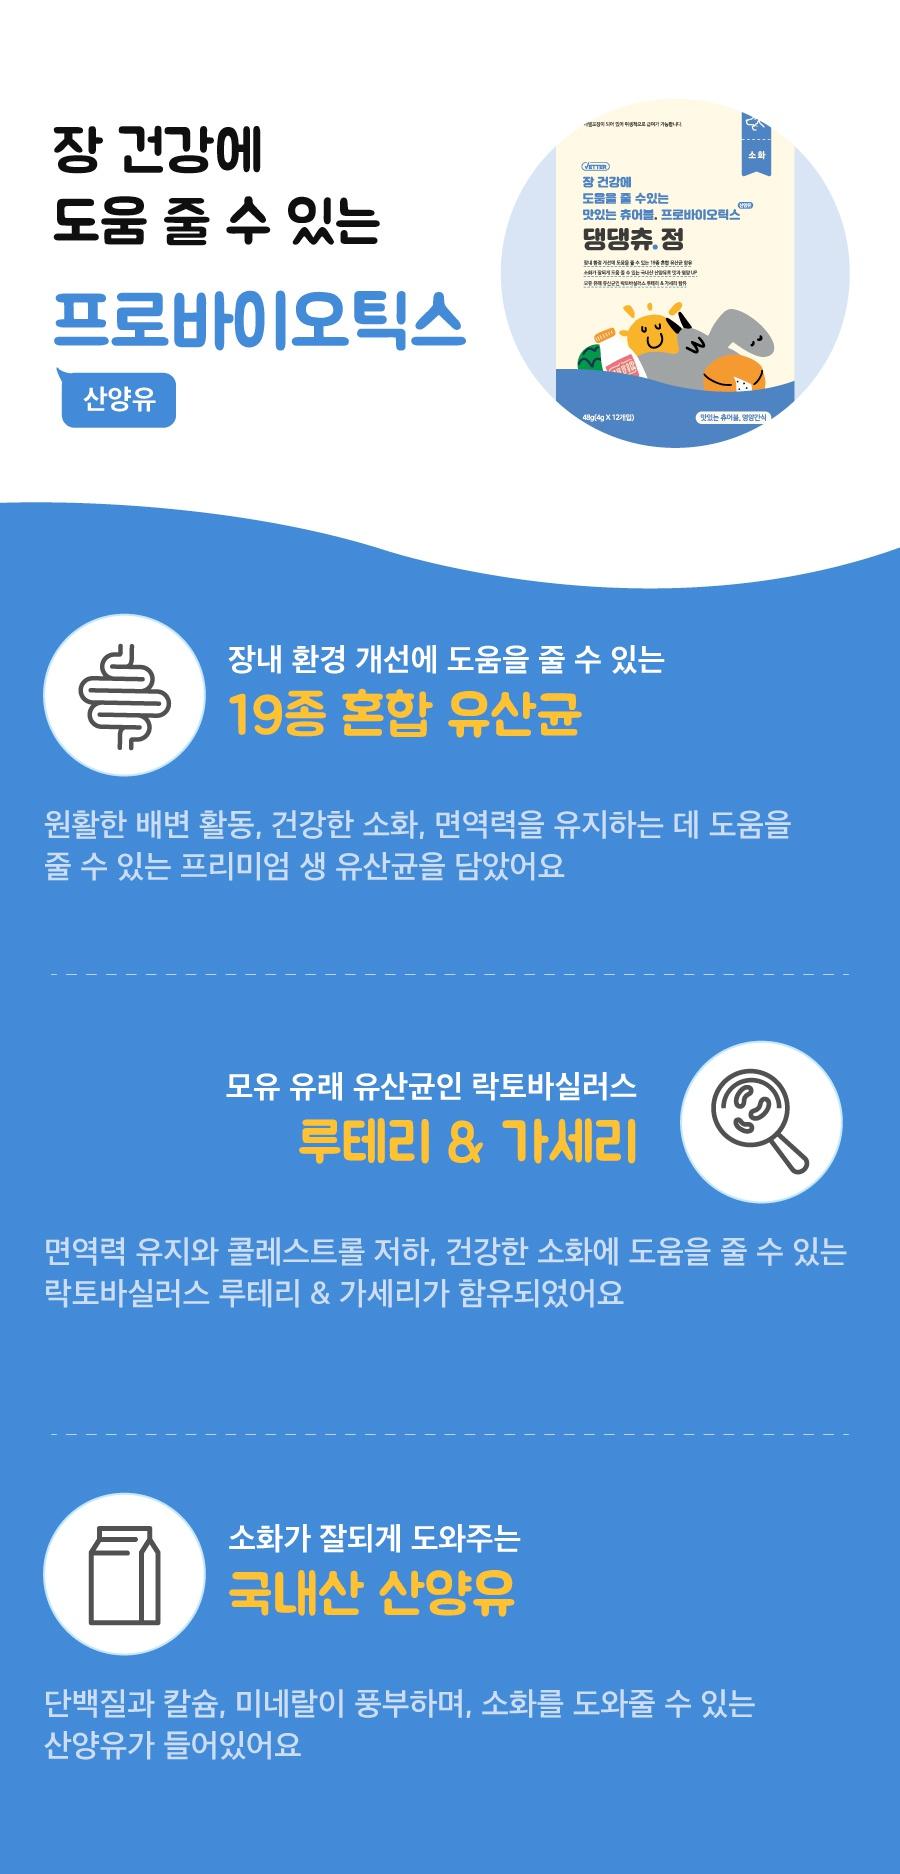 Vetter 댕댕츄정 대용량 (오메가3/프로바이오틱스/루테인/글루코사민)-상품이미지-9